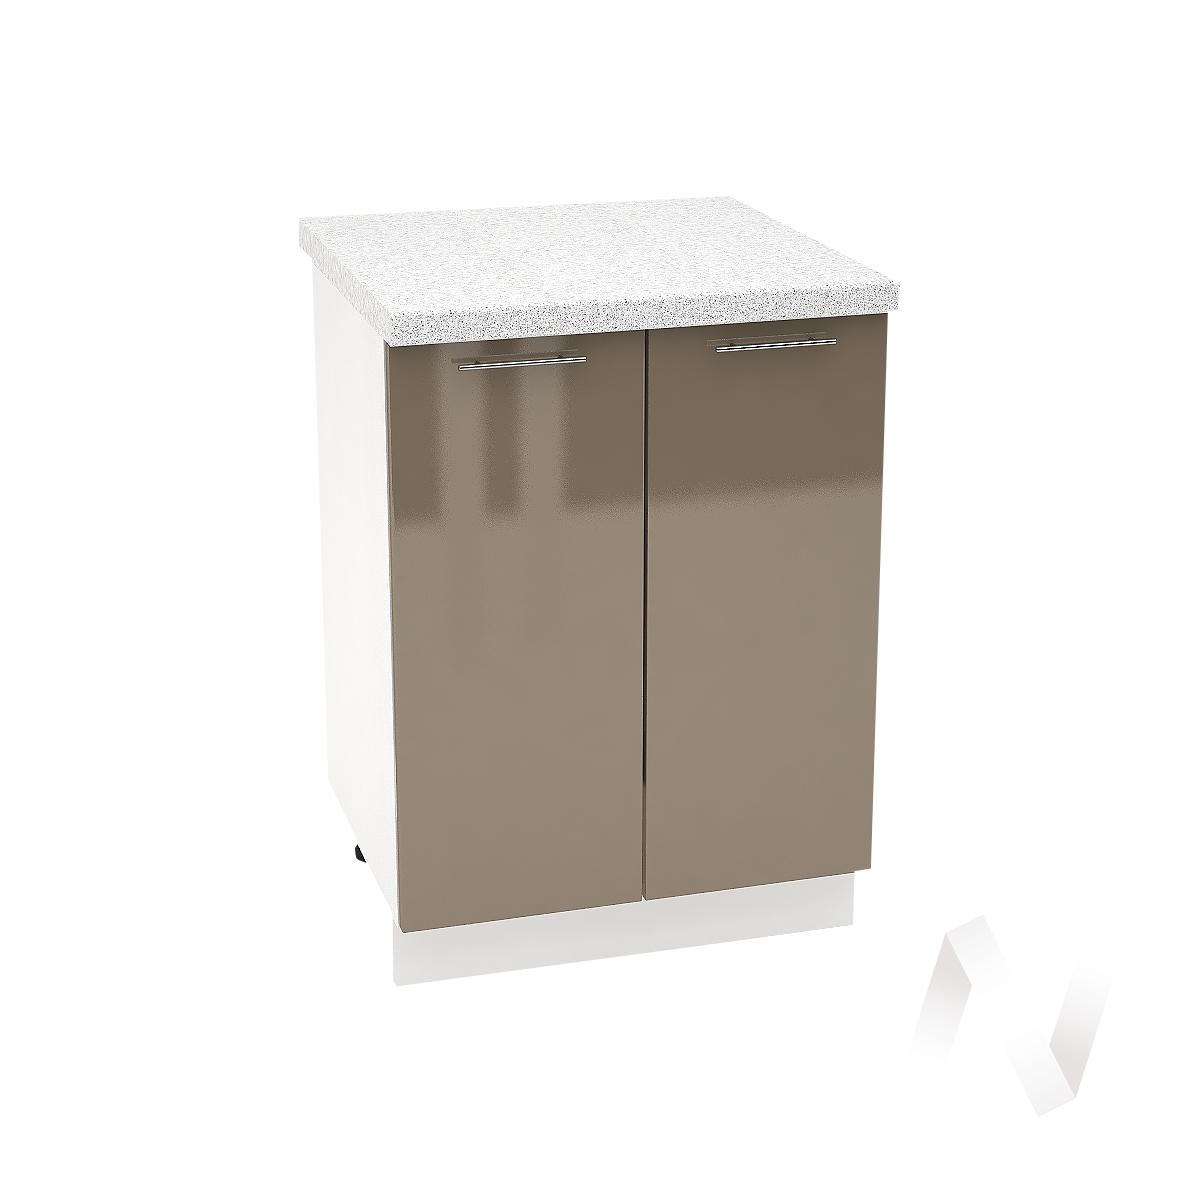 "Кухня ""Валерия-М"": Шкаф нижний 600, ШН 600 новый (Капучино глянец/корпус белый)"